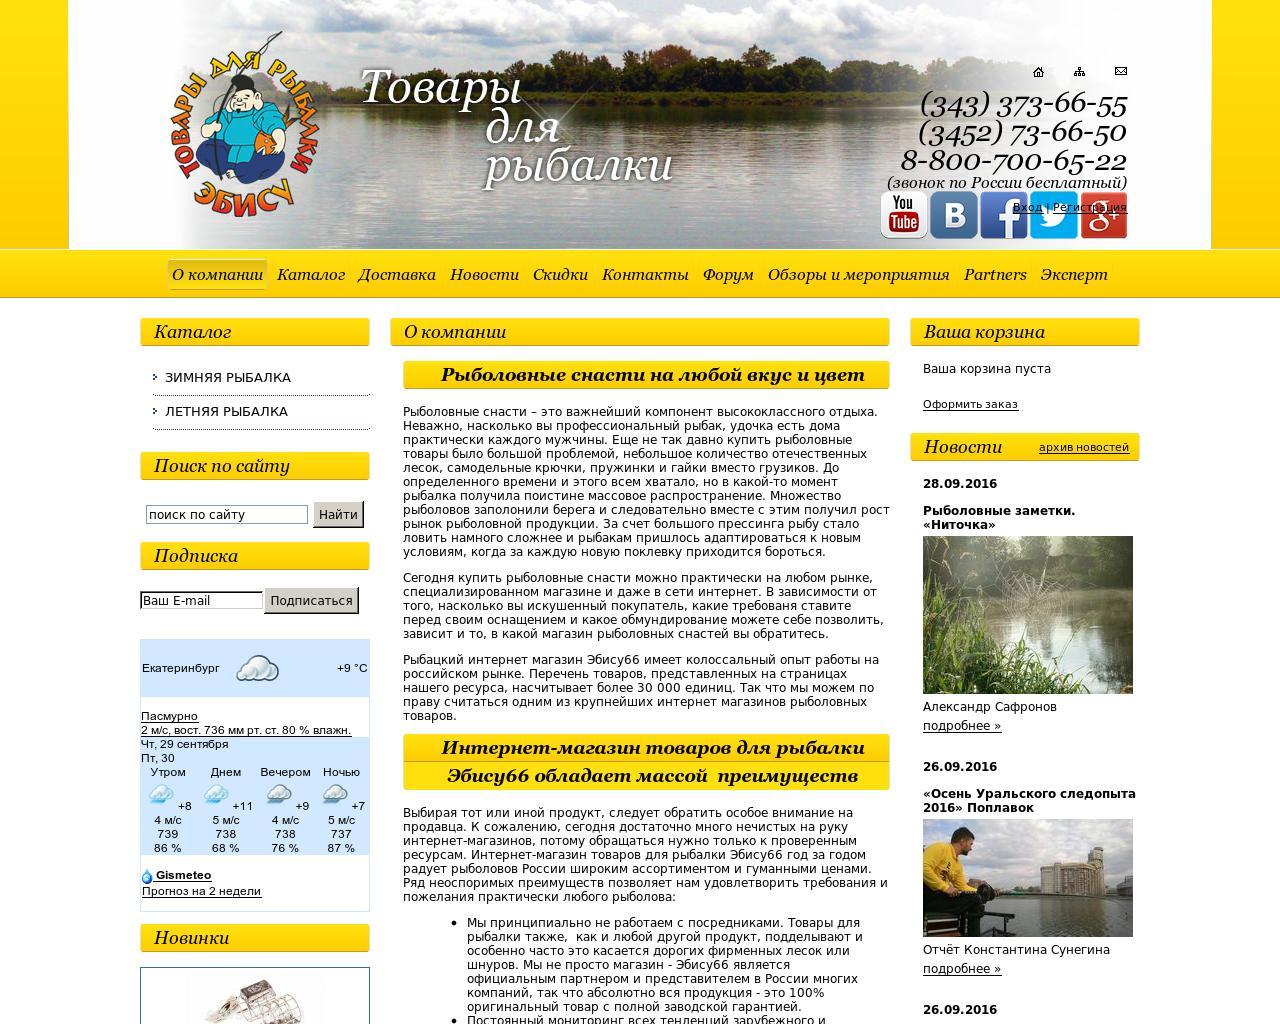 сайты для заказа рыболовных товаров